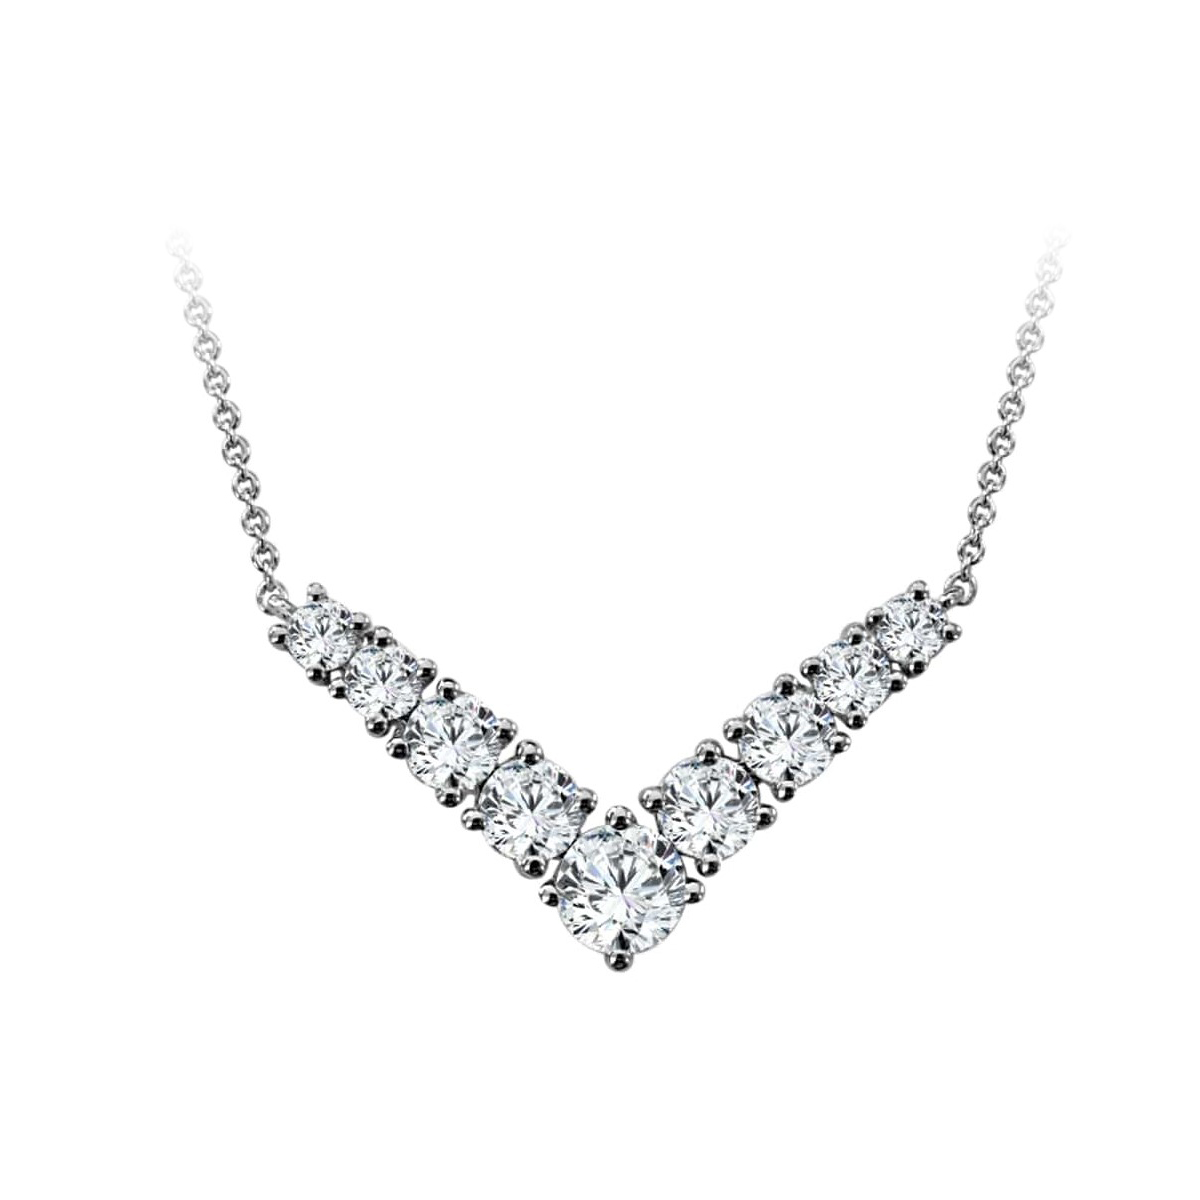 Paramount Gems 14 Karat White Gold 1.5 Carat Diamond V Necklace